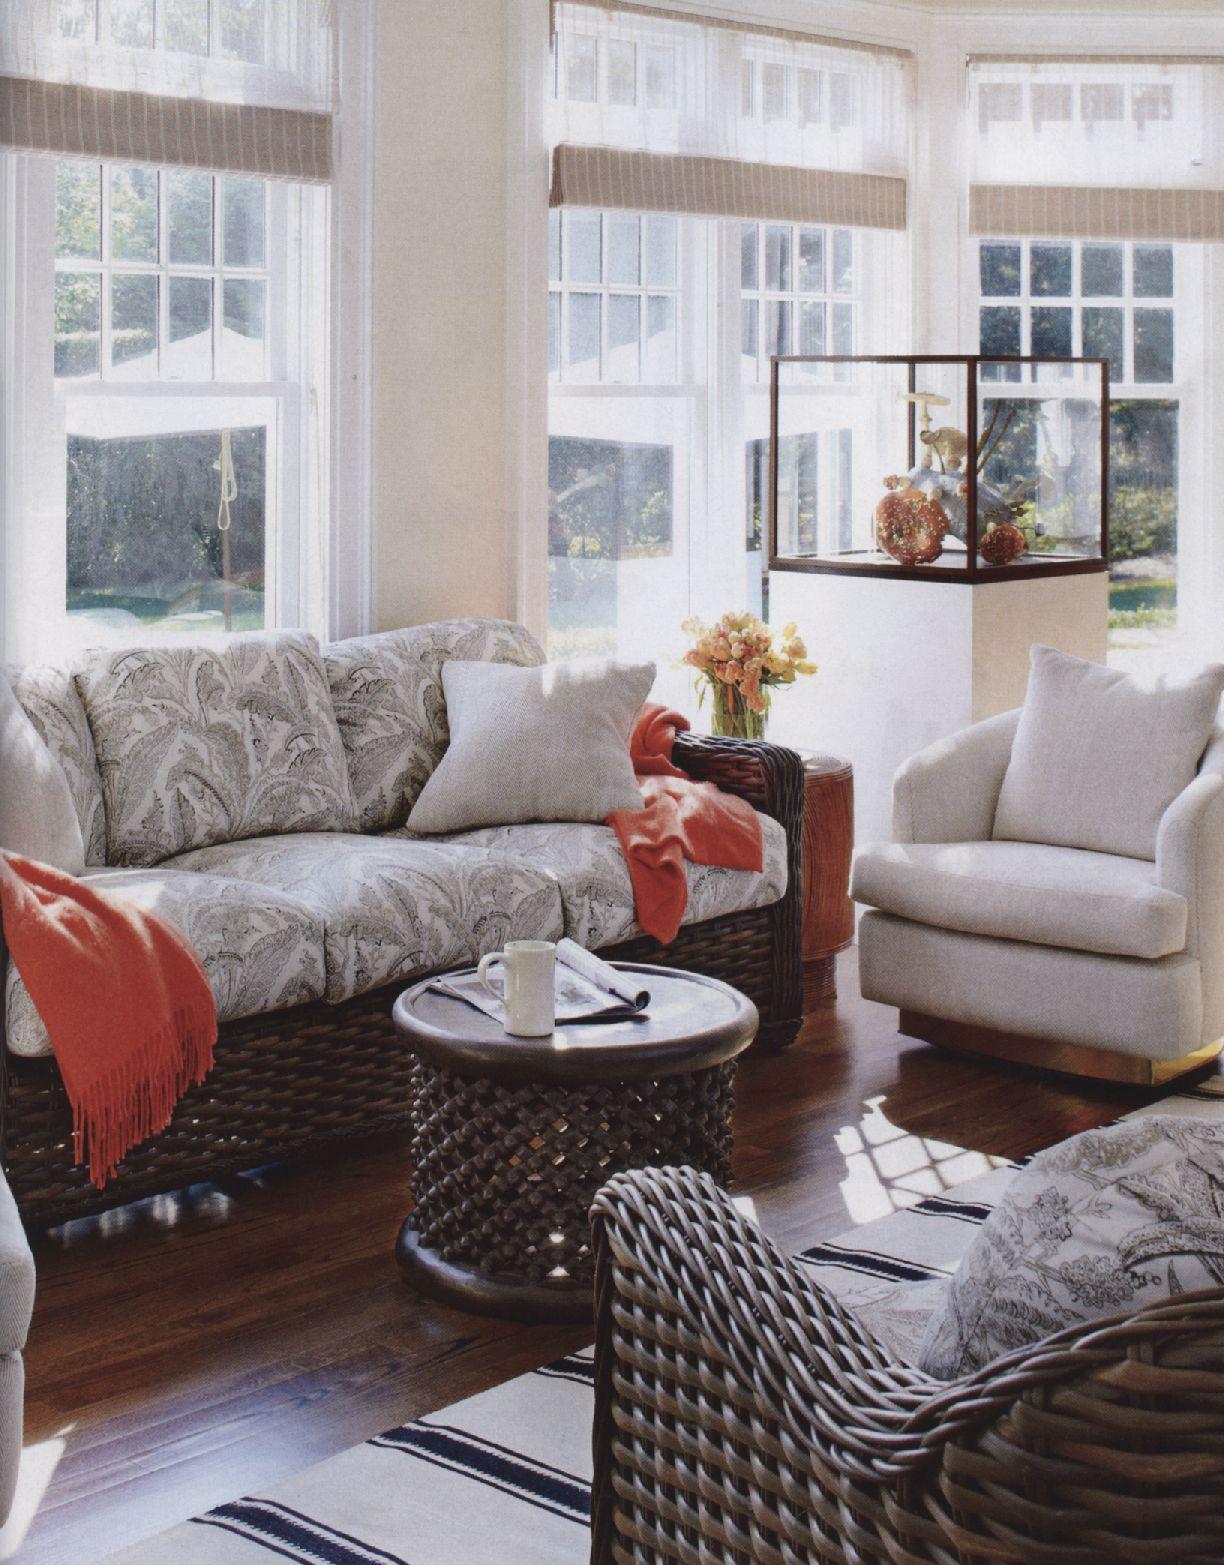 House Beautiful, page 111 Kravet, Sofa & Chair Fabric